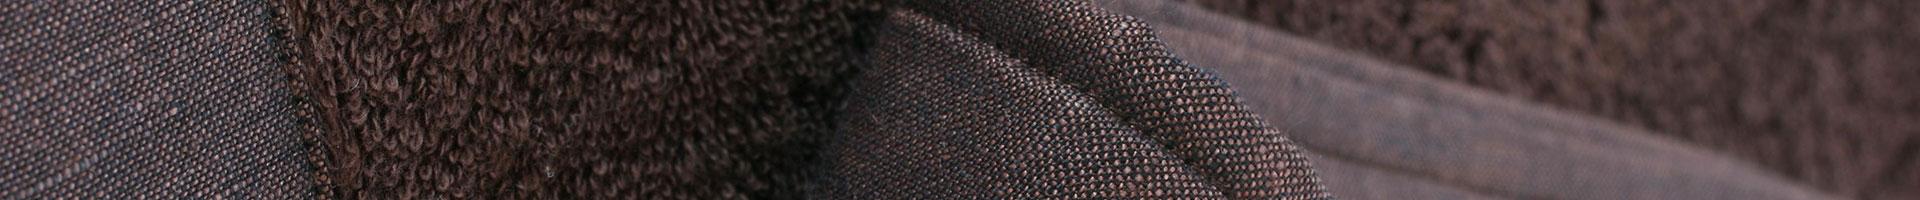 Brown bath set cotton bordered in linen